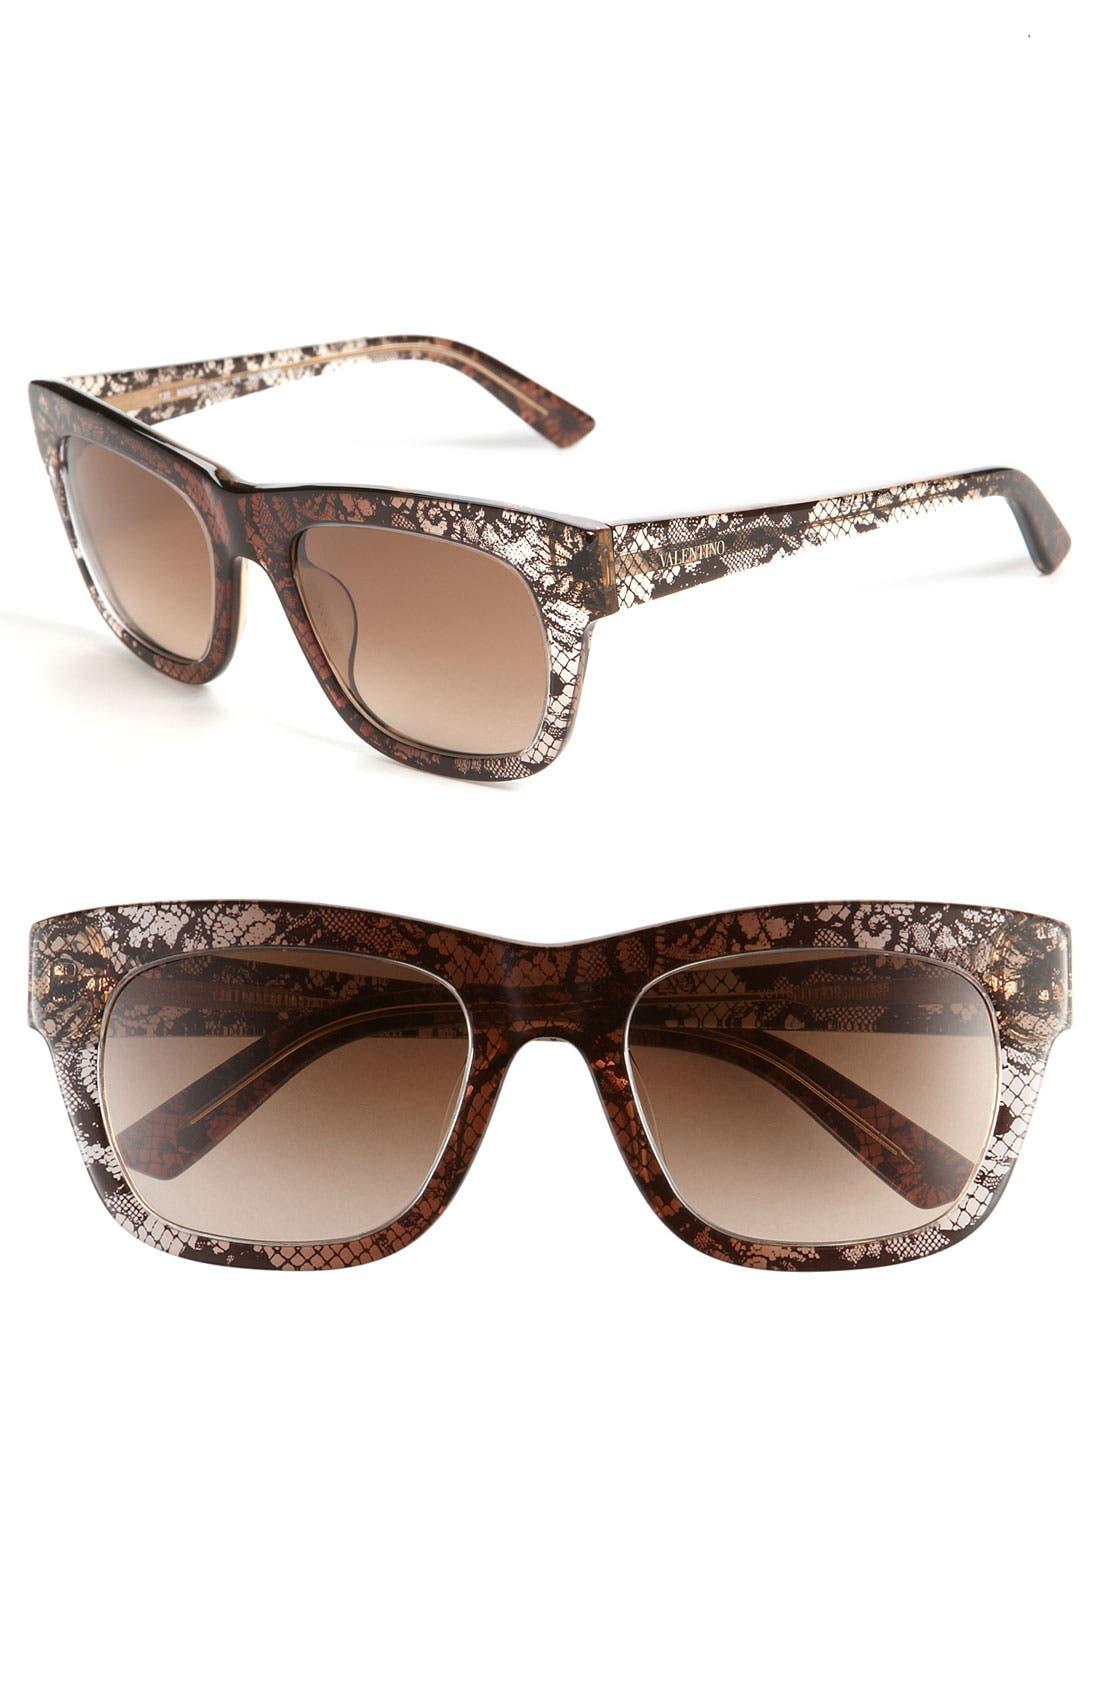 Alternate Image 1 Selected - Valentino Sunglasses